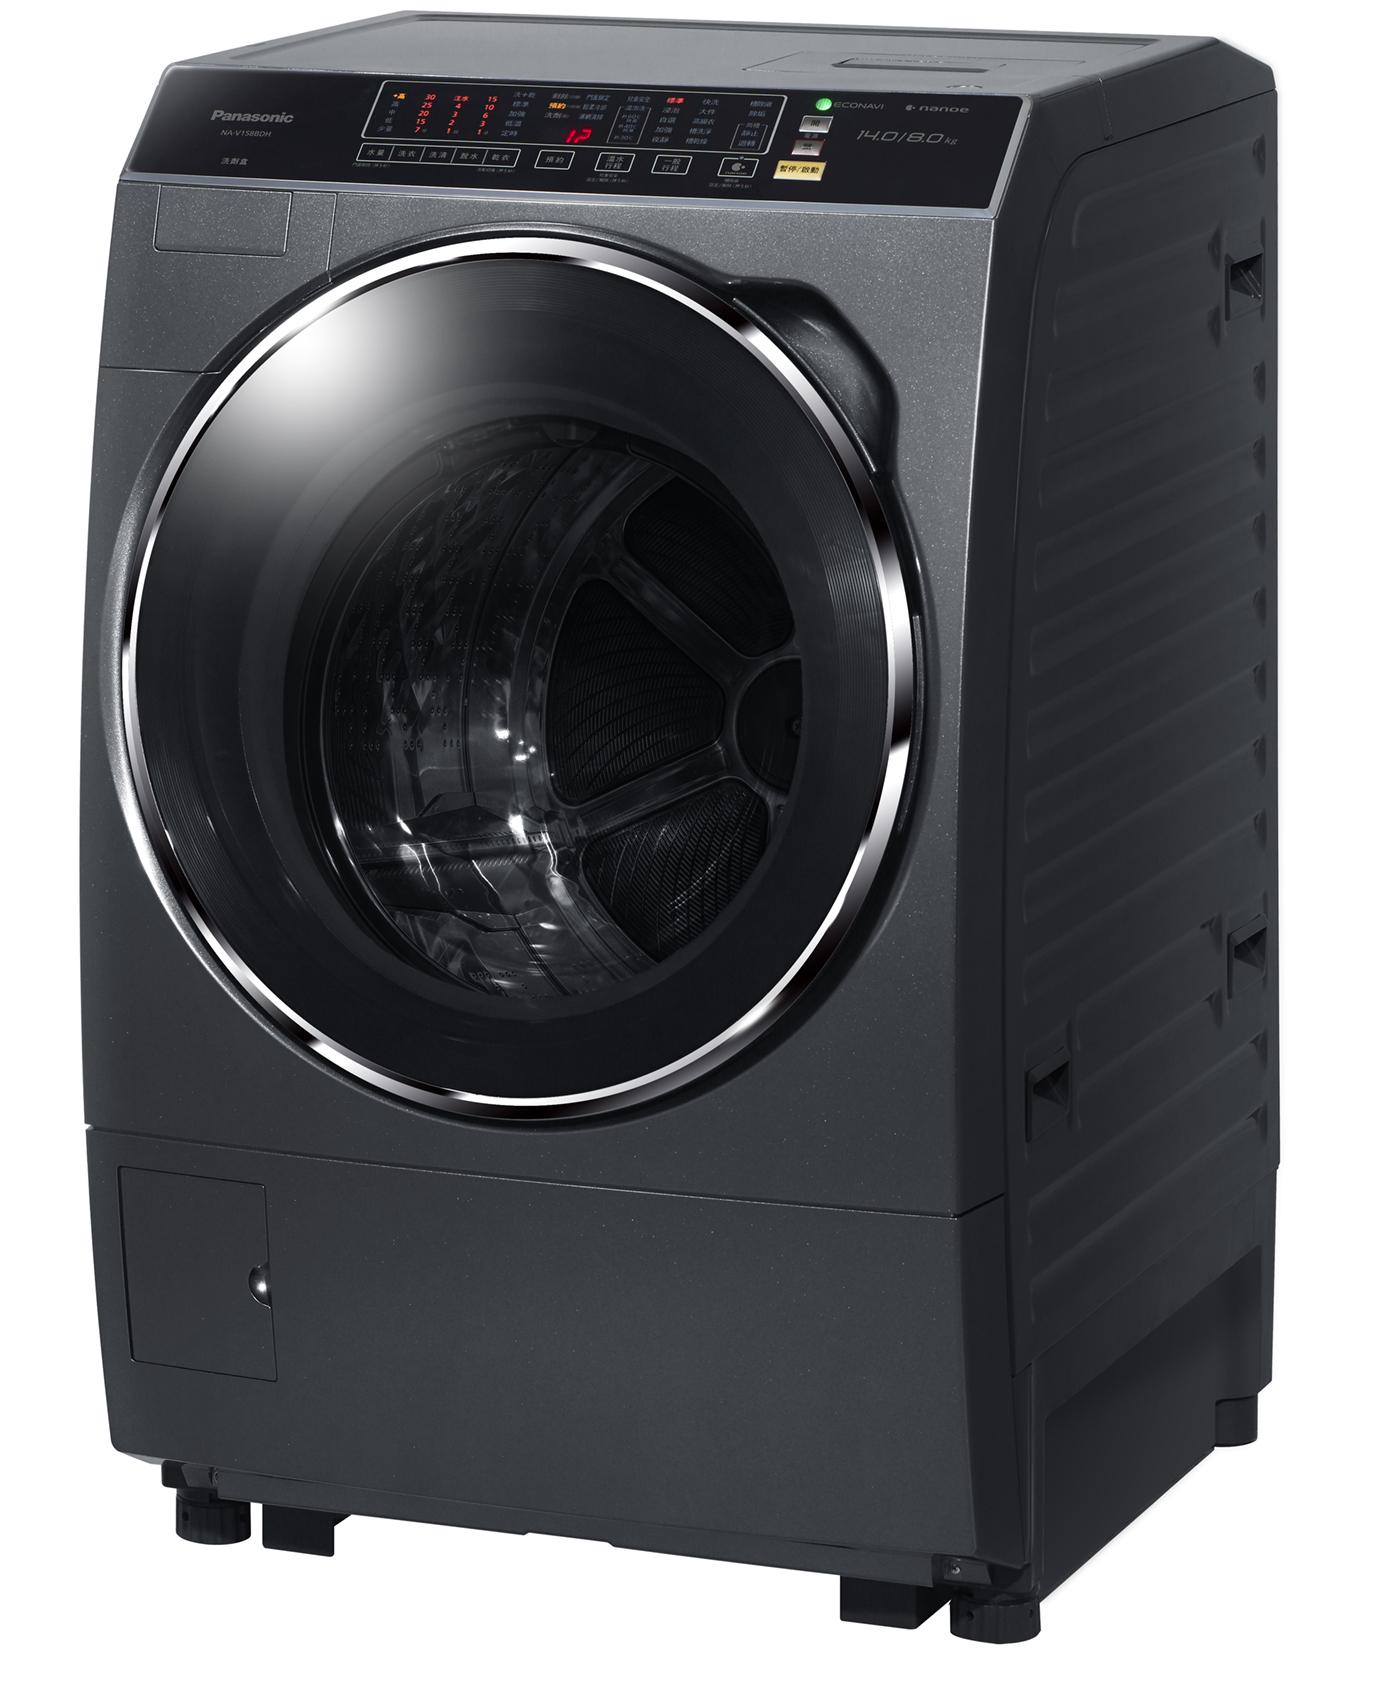 Panasonic 國際牌 NA-V130DDH-G 洗脫烘滾筒式洗衣機(13KG) ★指定區域配送安裝★